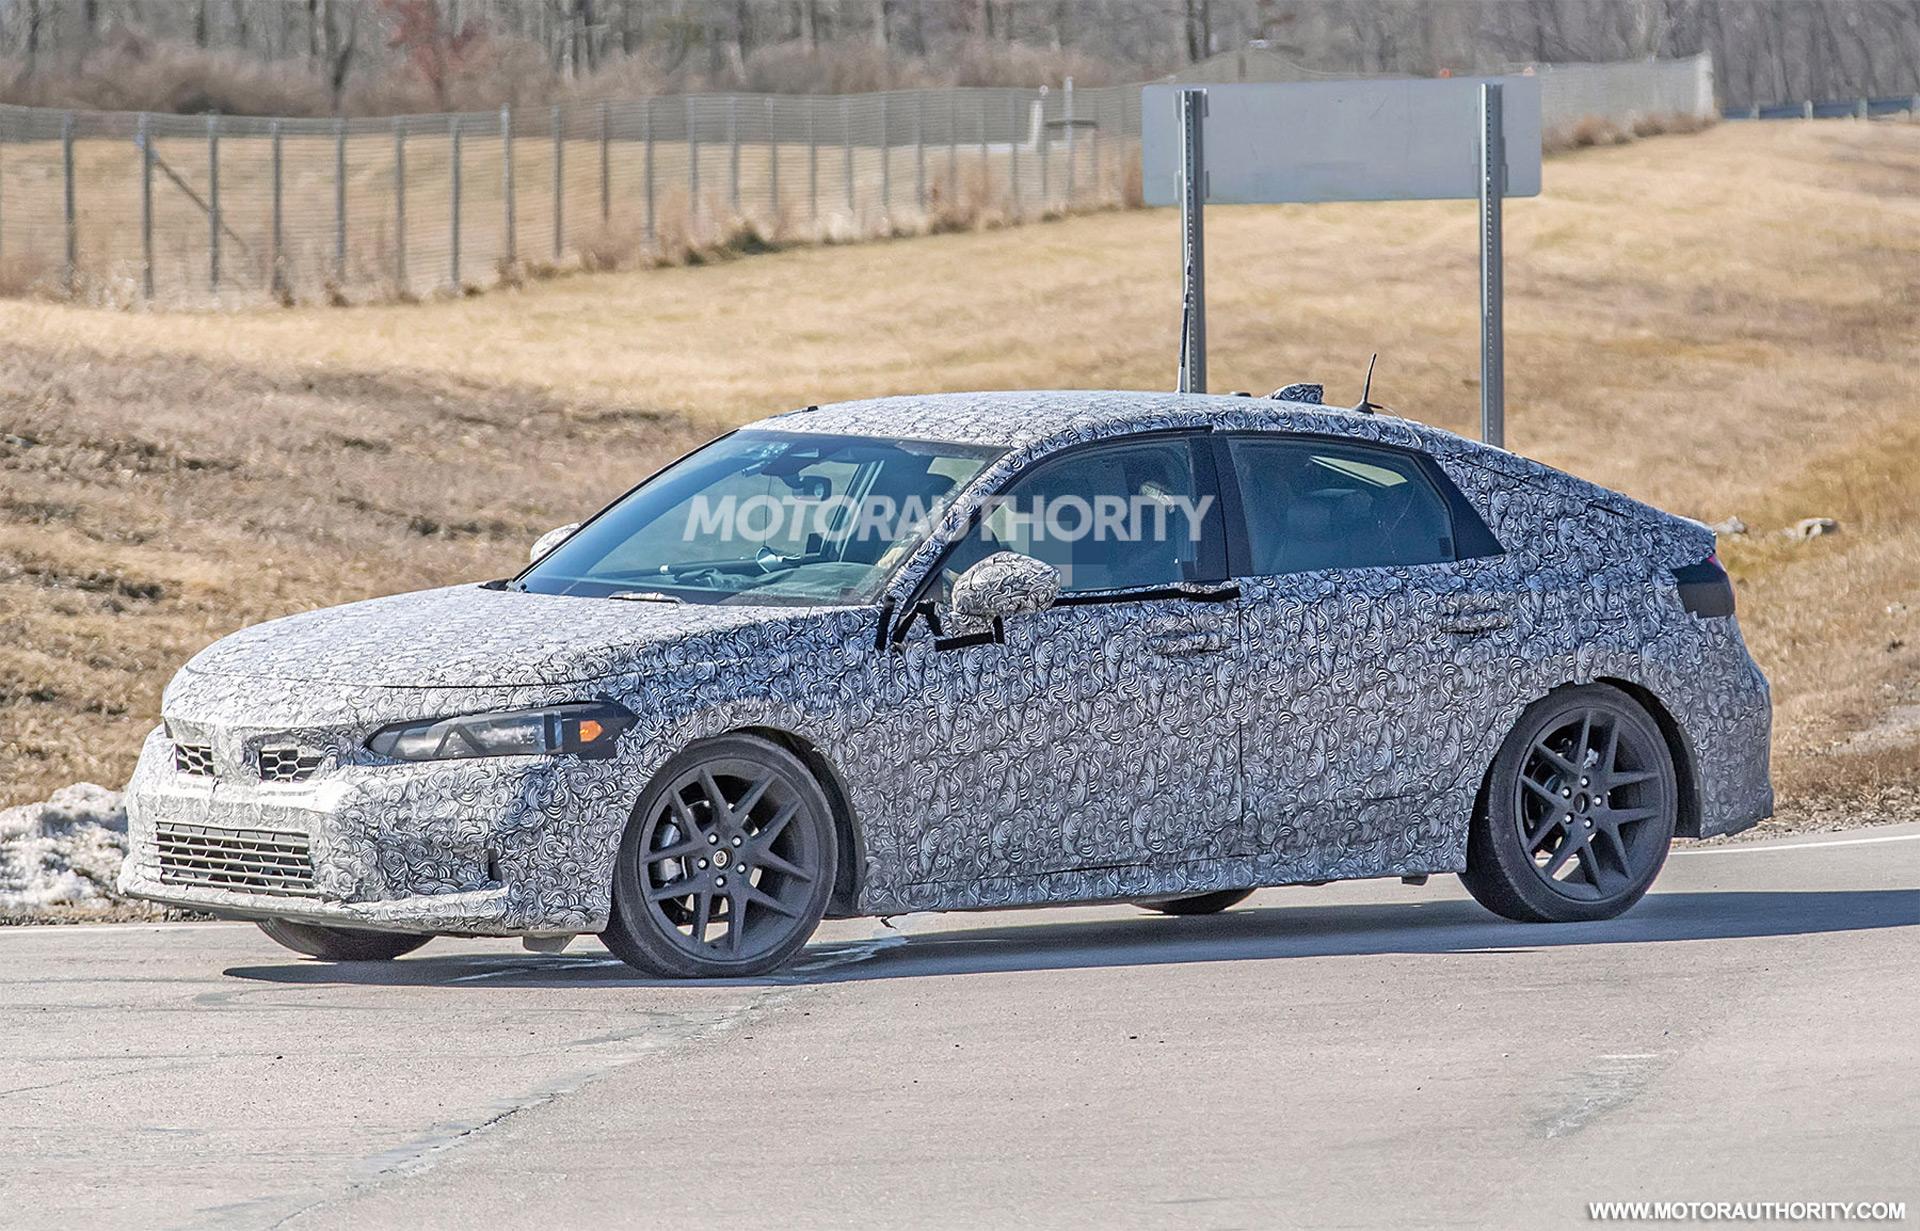 2022 Honda Civic Hatchback spy shots: More mature compact hatch on the way